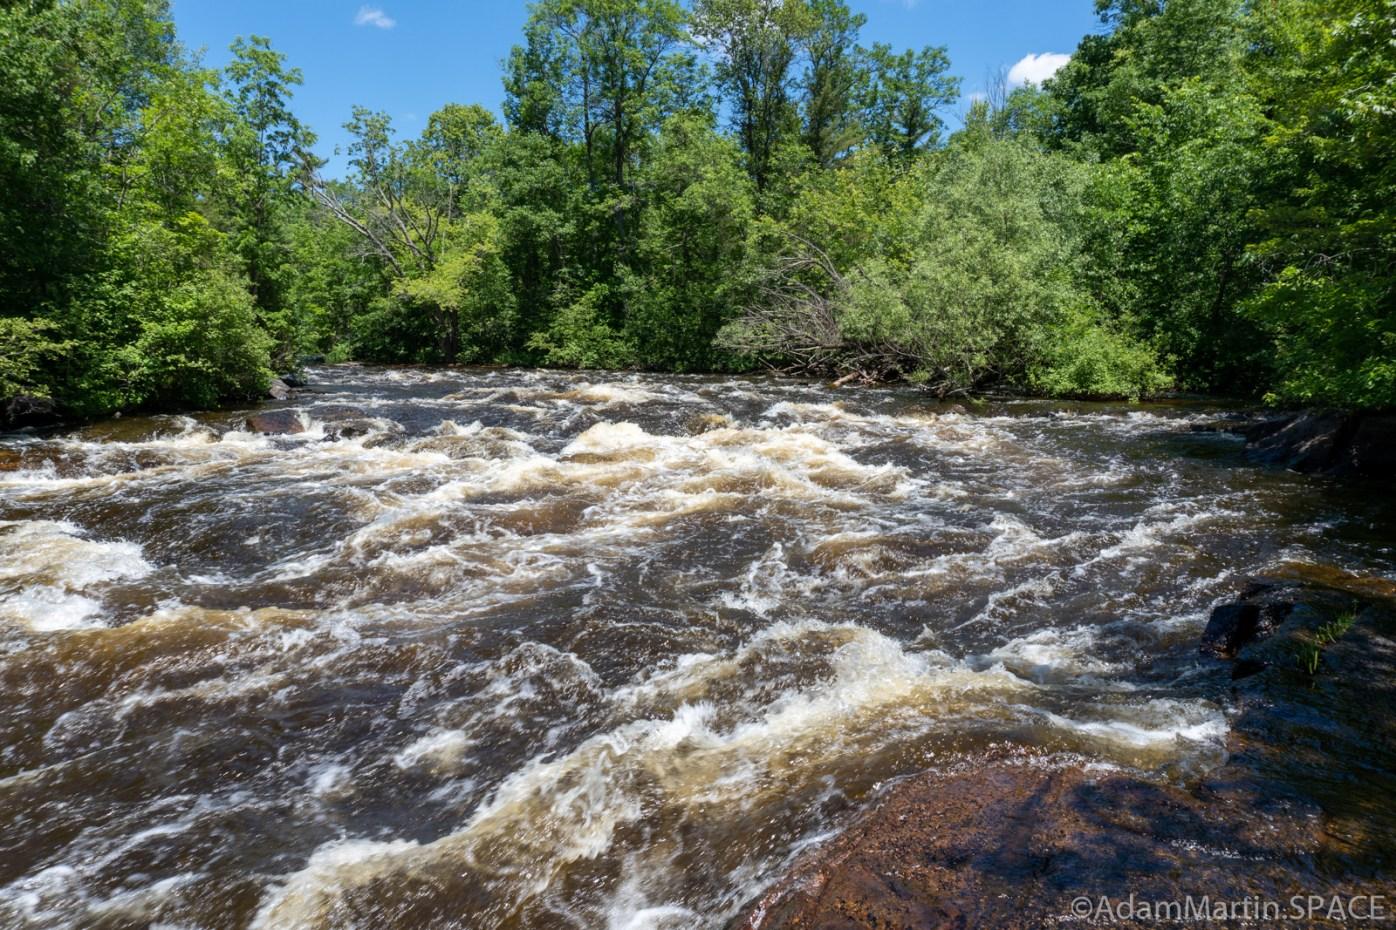 Ducknest Rapids